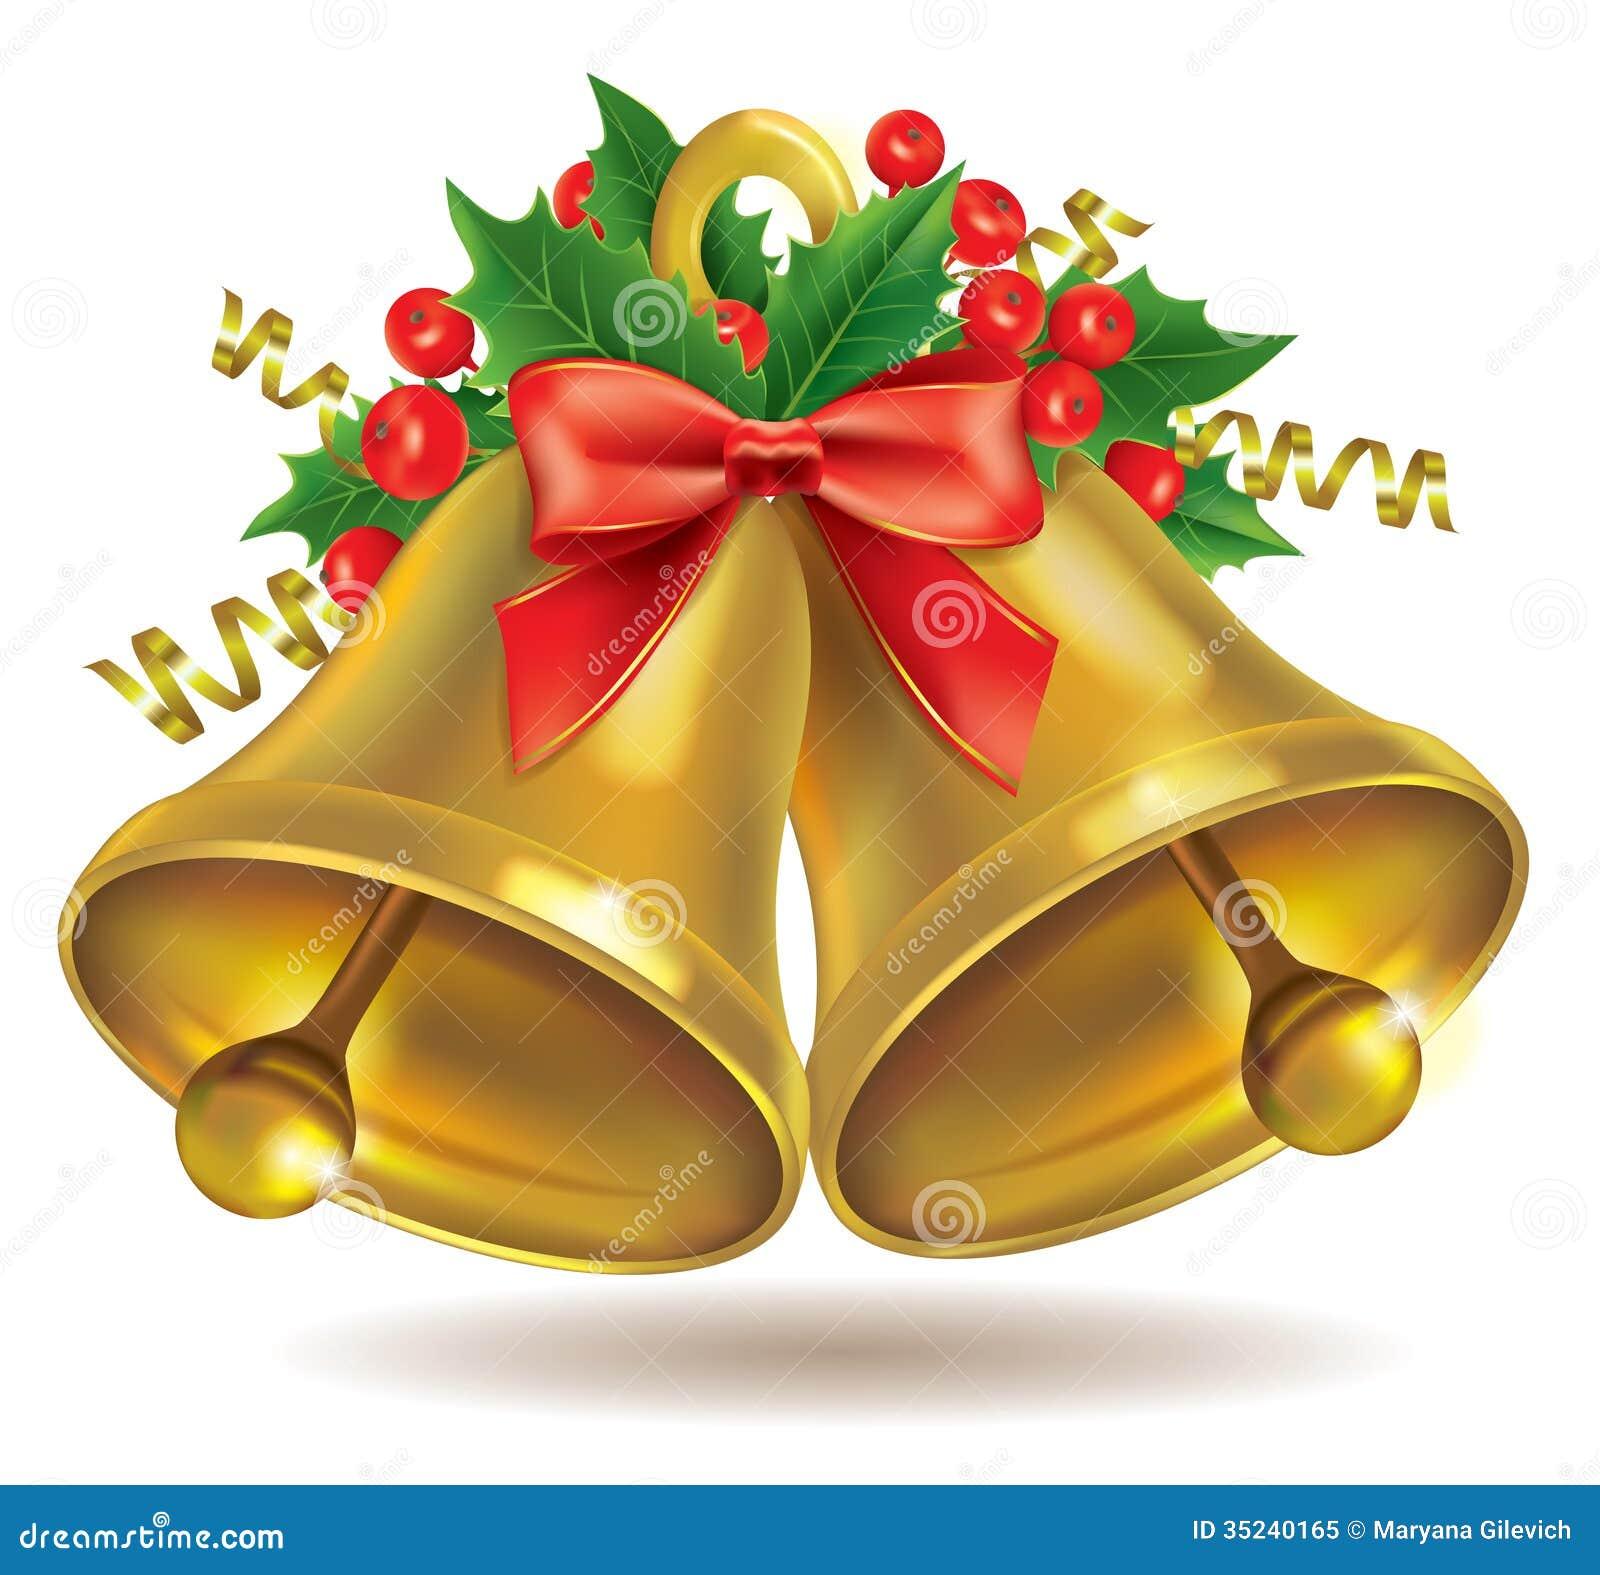 christmas bells stock vector illustration of cute holly. Black Bedroom Furniture Sets. Home Design Ideas